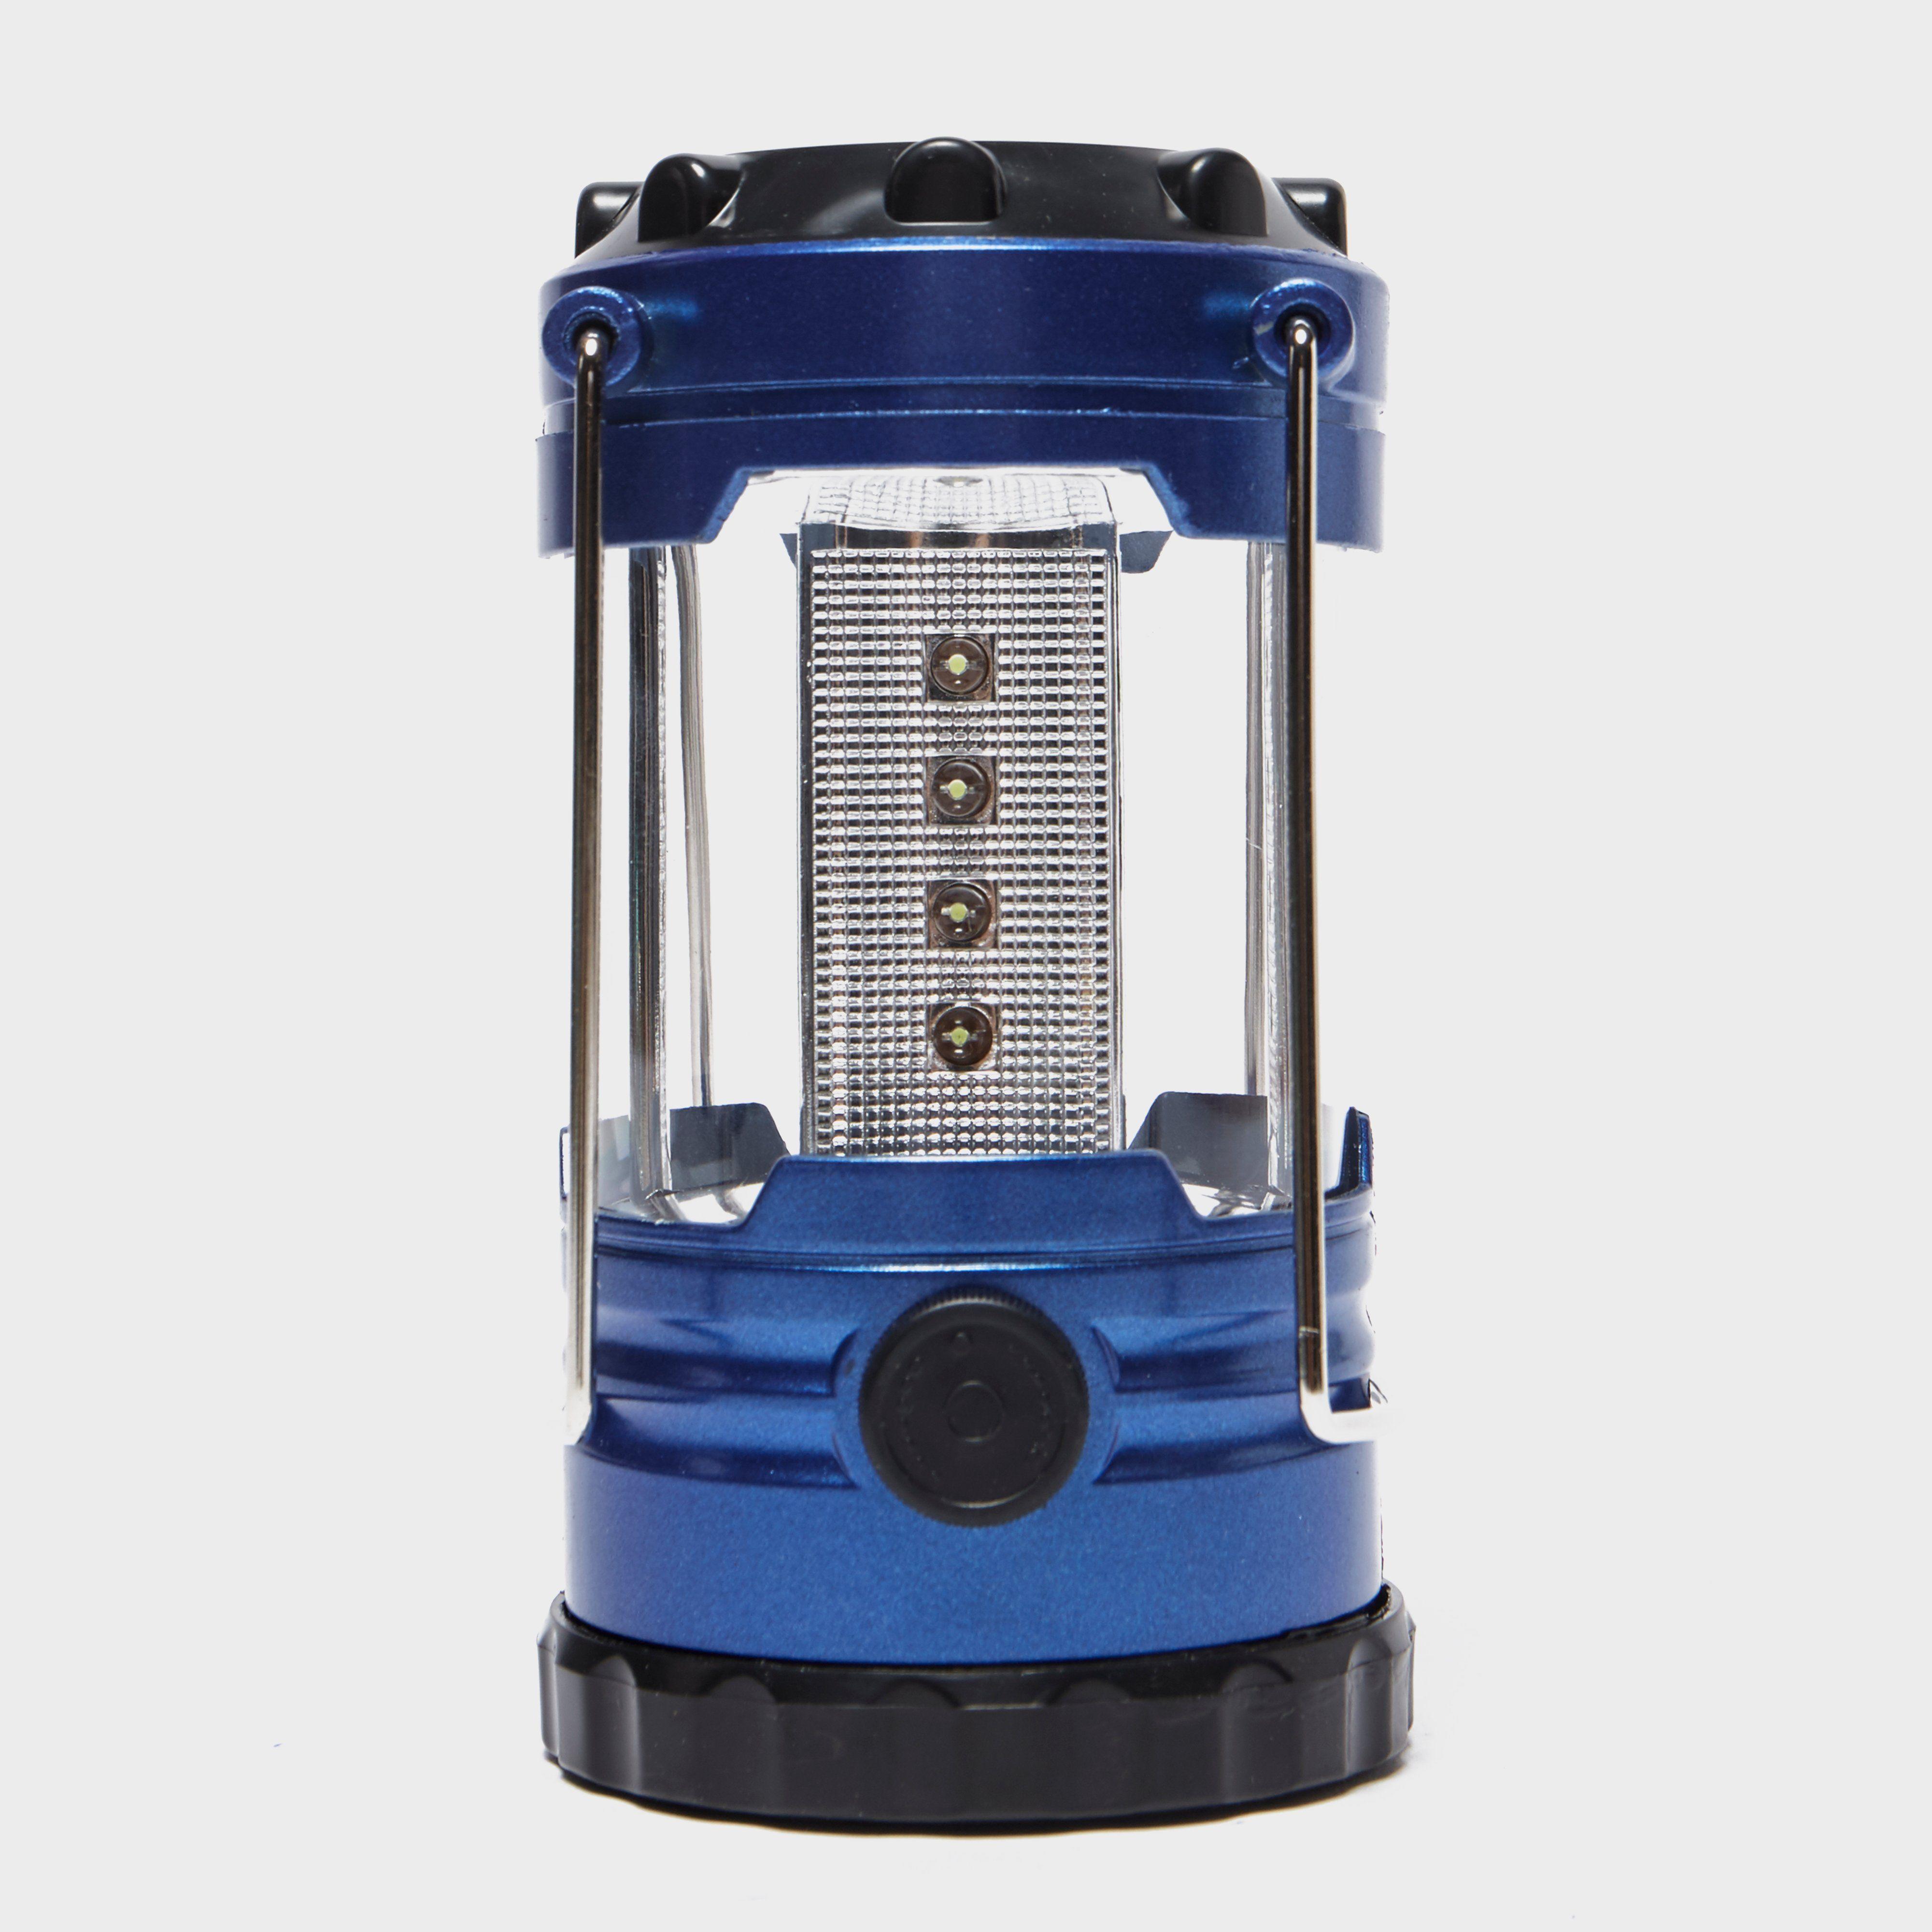 EUROHIKE 12-LED Camping Lantern